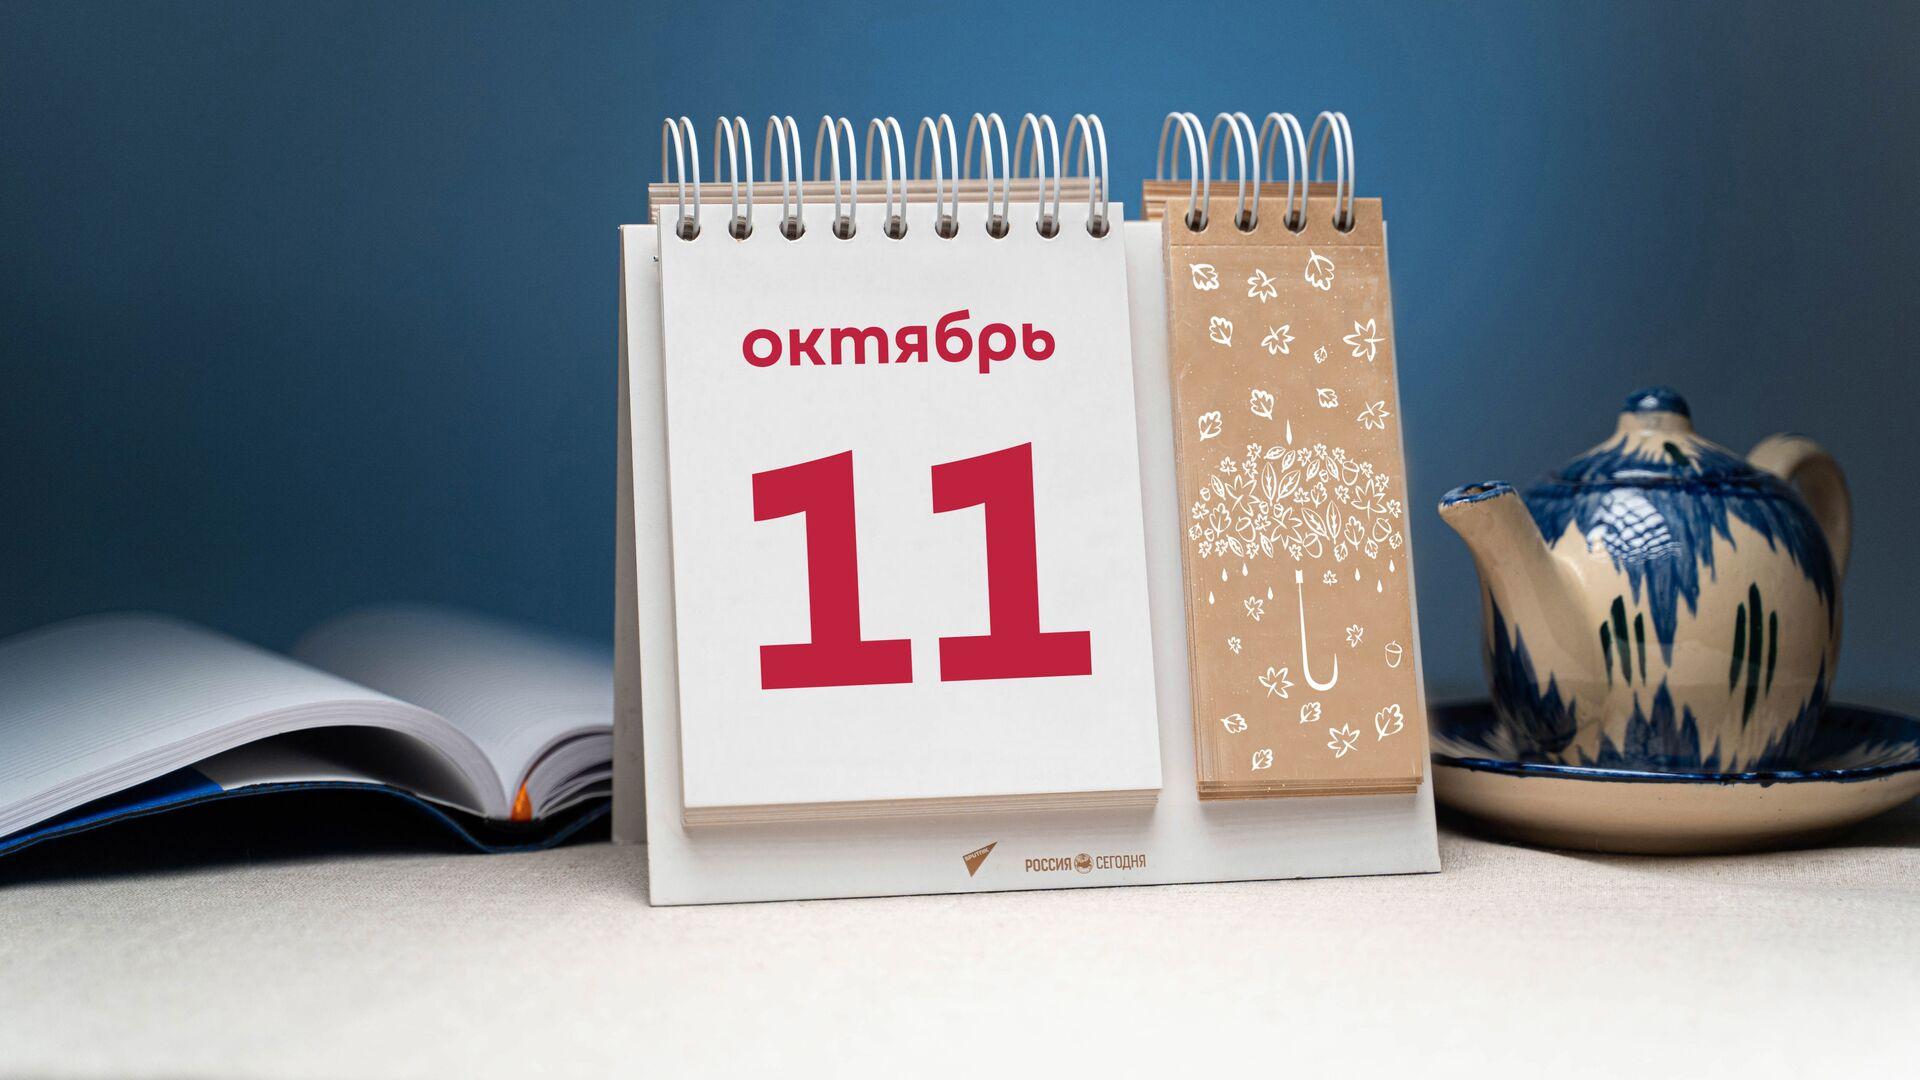 День 11 октября - Sputnik Тоҷикистон, 1920, 11.10.2021